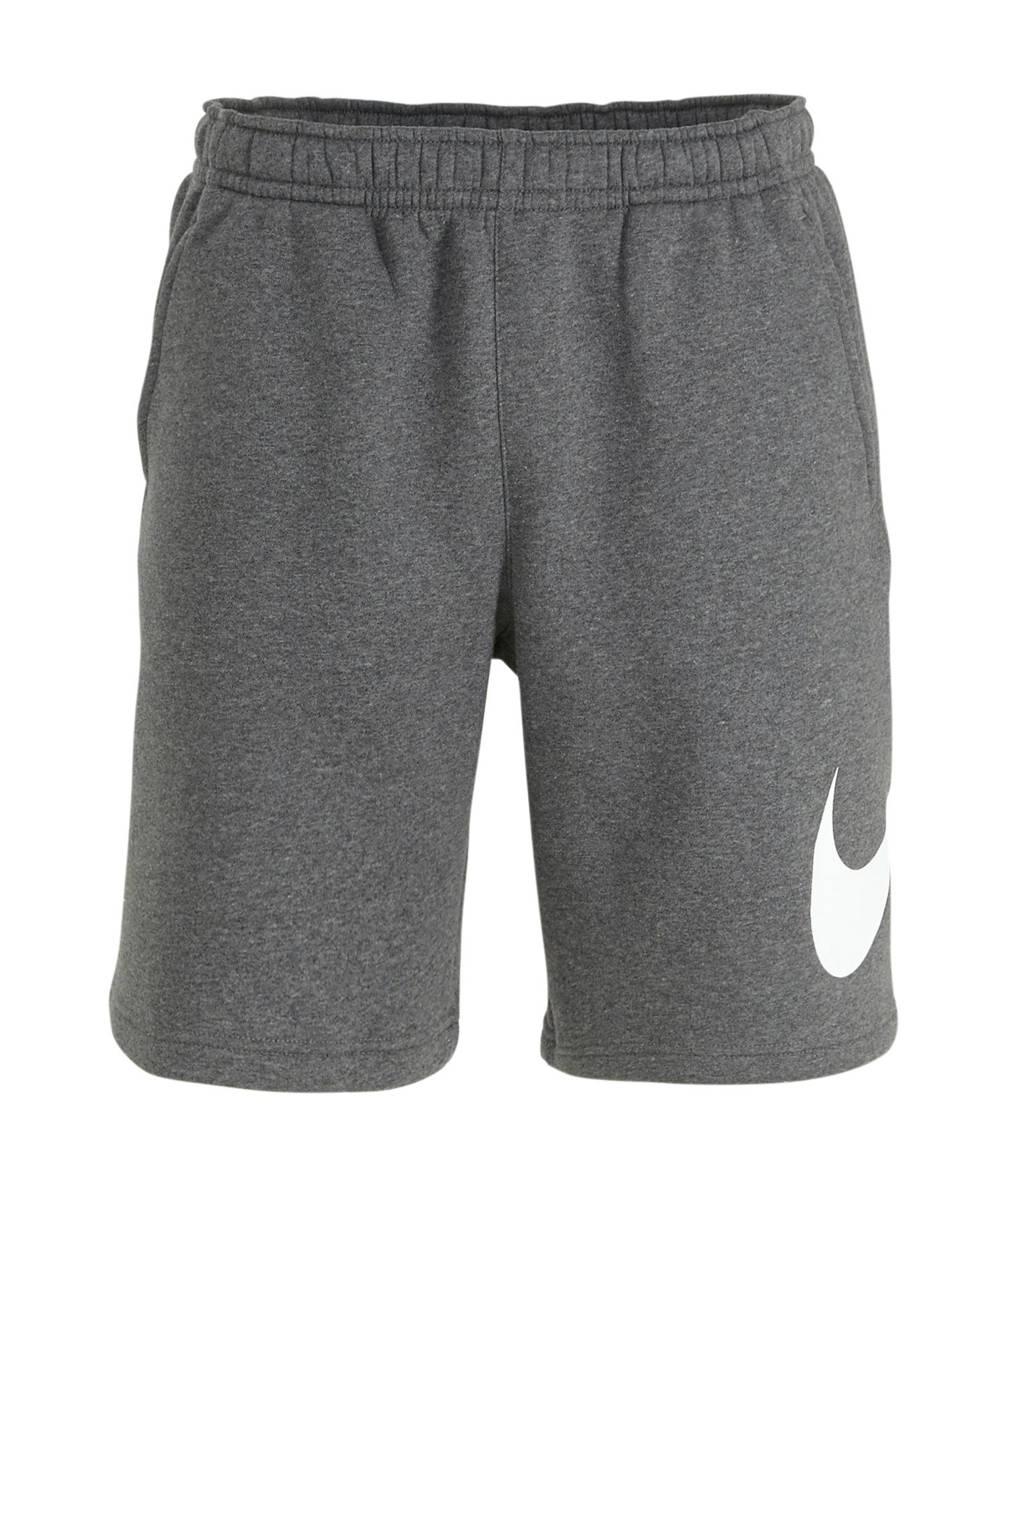 Nike short donkergrijs, Grijs